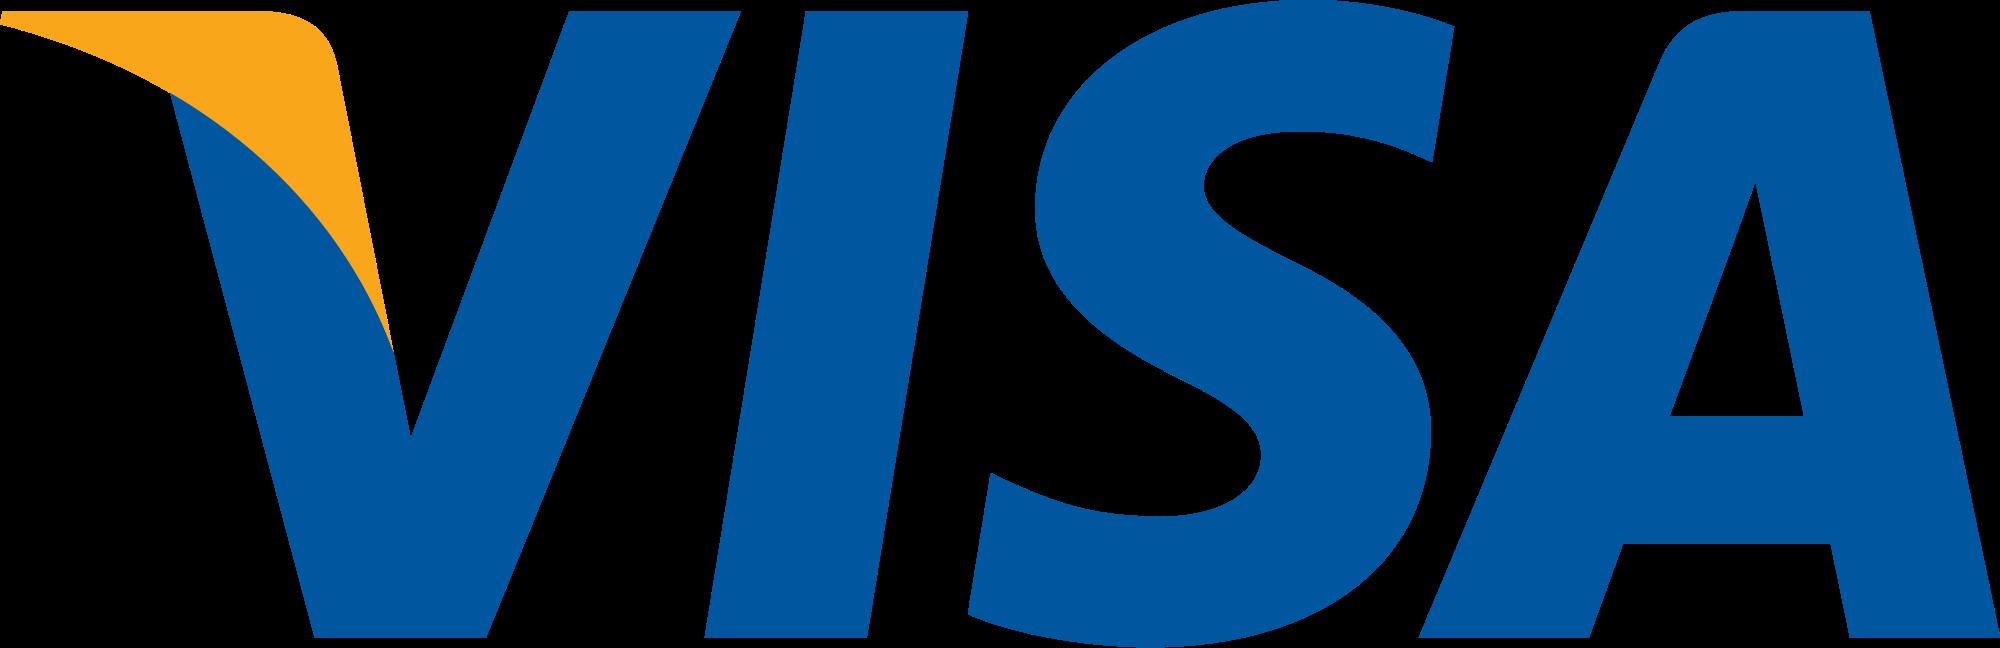 visa logo png #2018